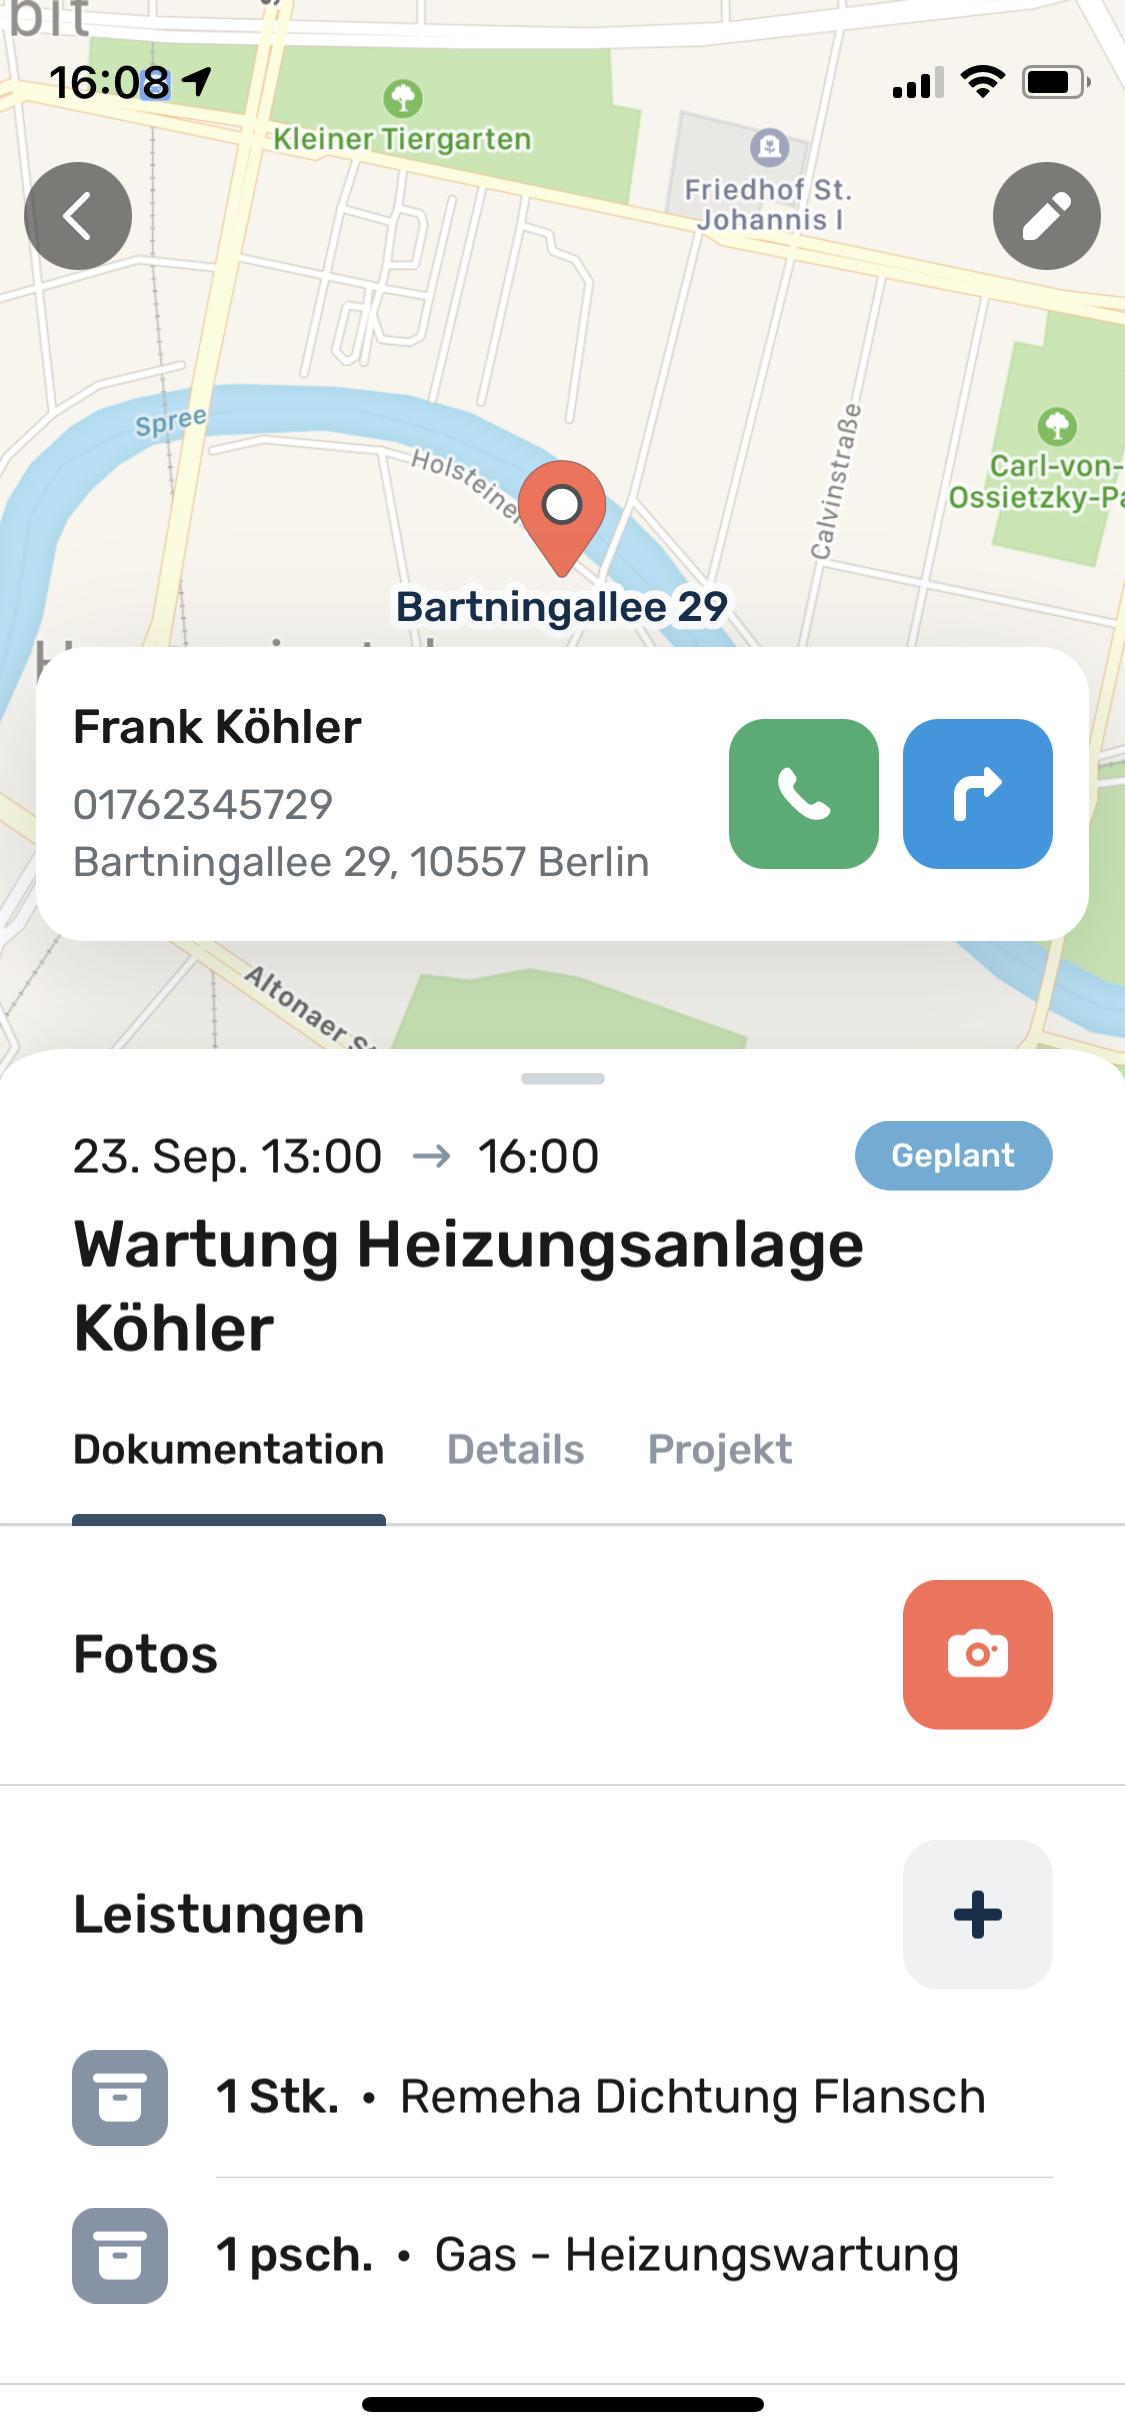 Terminplanung und Dokumentation. Foto: © ToolTime GmbH